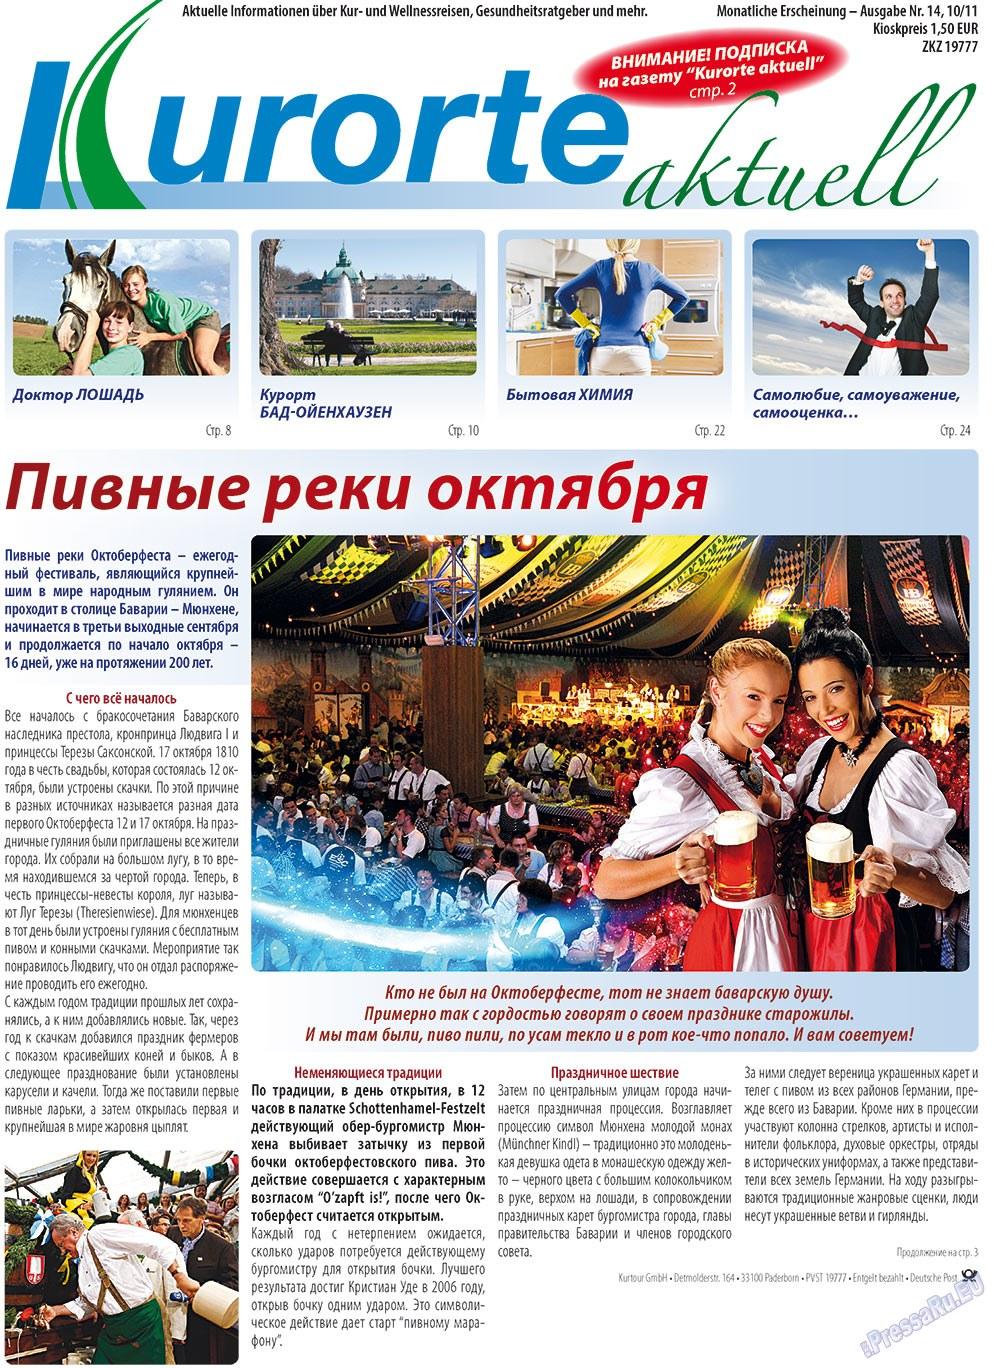 Kurorte aktuell (газета). 2011 год, номер 10, стр. 1